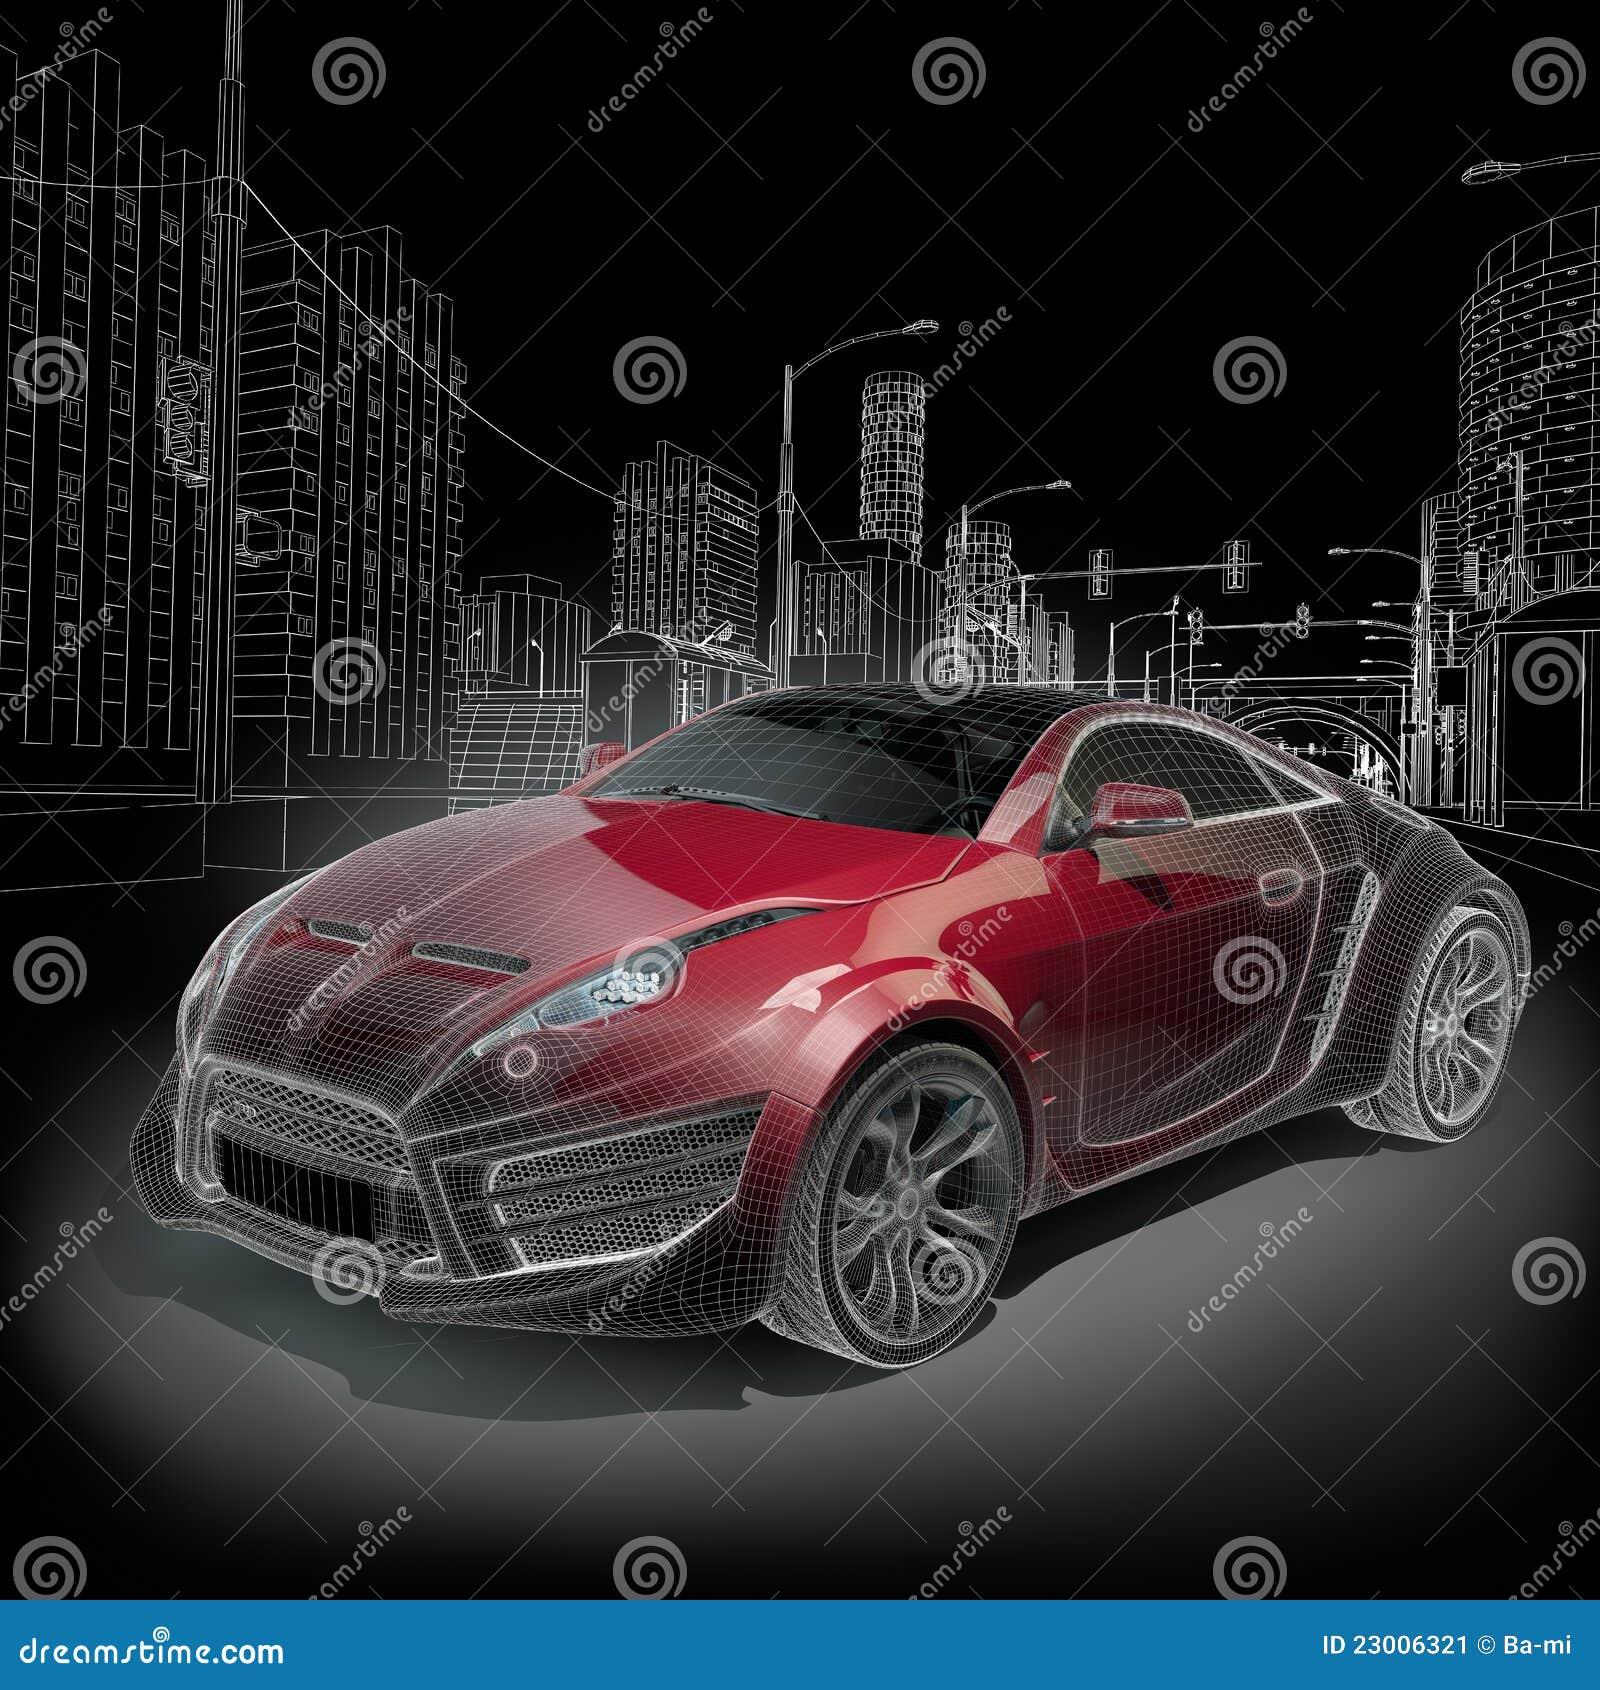 sports car wireframe stock illustration image of prototype 23006321. Black Bedroom Furniture Sets. Home Design Ideas